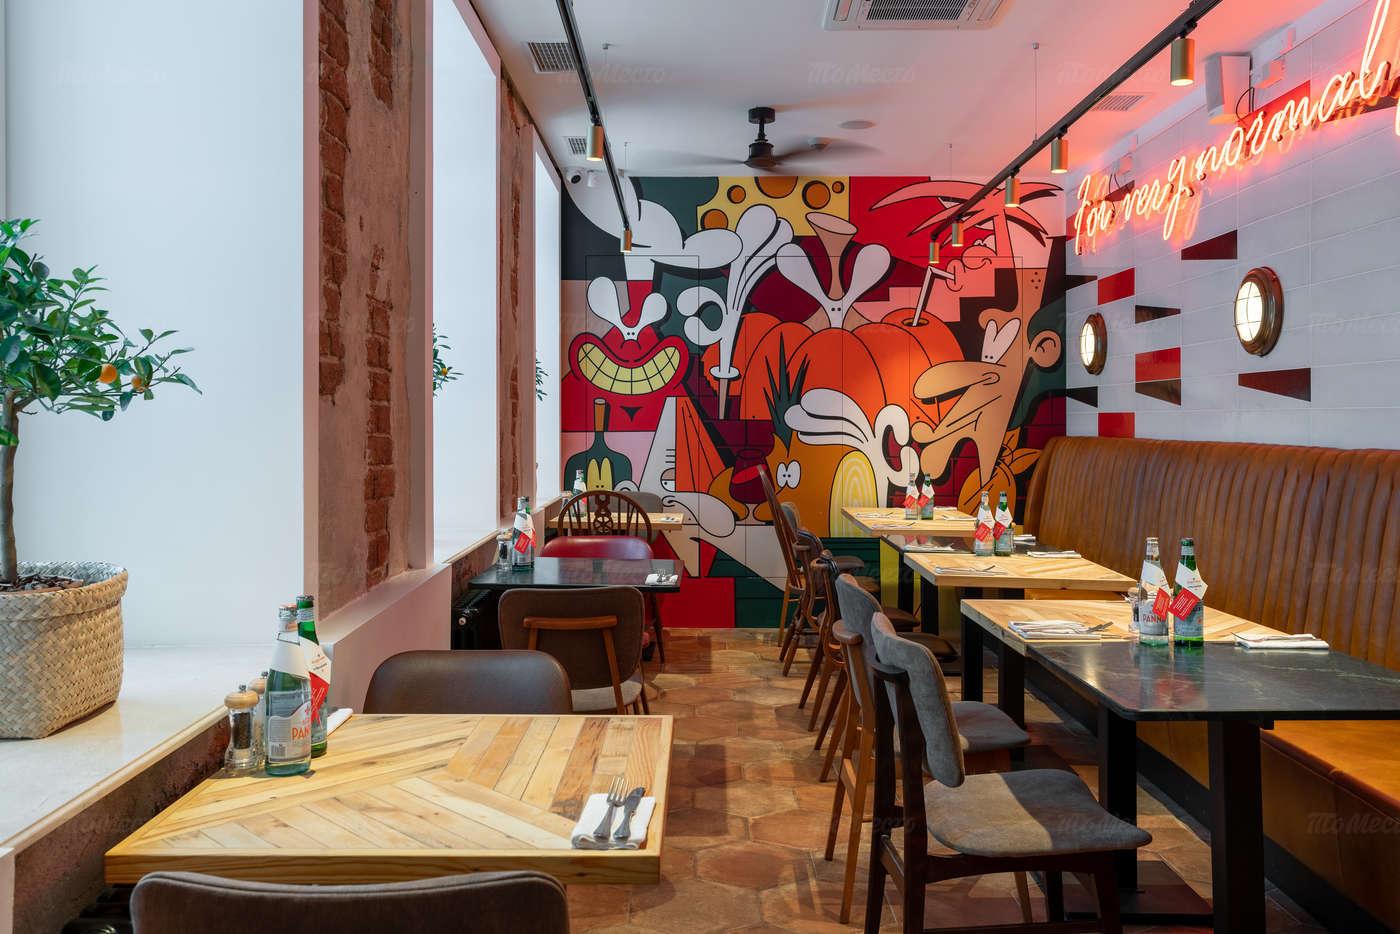 Ресторан Pinzeria by Bontempi (Пинцерия Бонтемпи) на Верх-Исетском бульваре фото 5